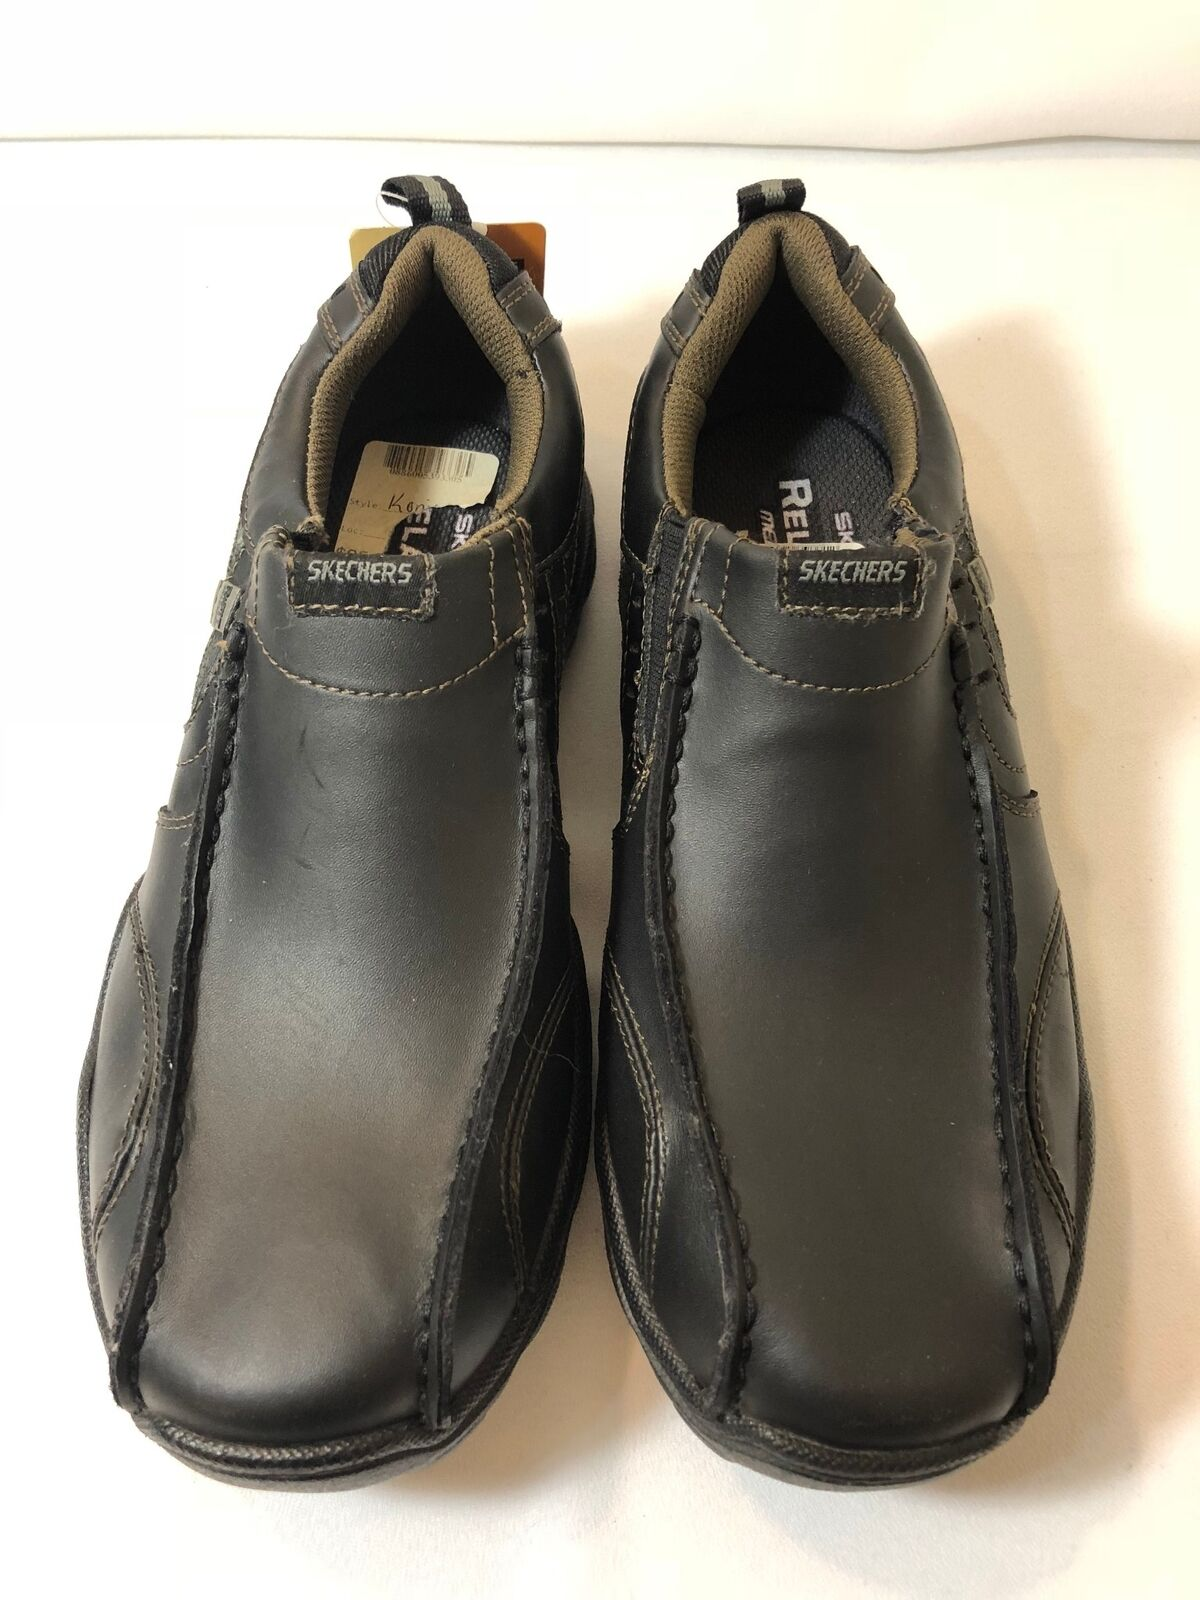 Skechers Men's Konic Relaxed Fit Memory Foam Loafers shoes Slip On Size 8